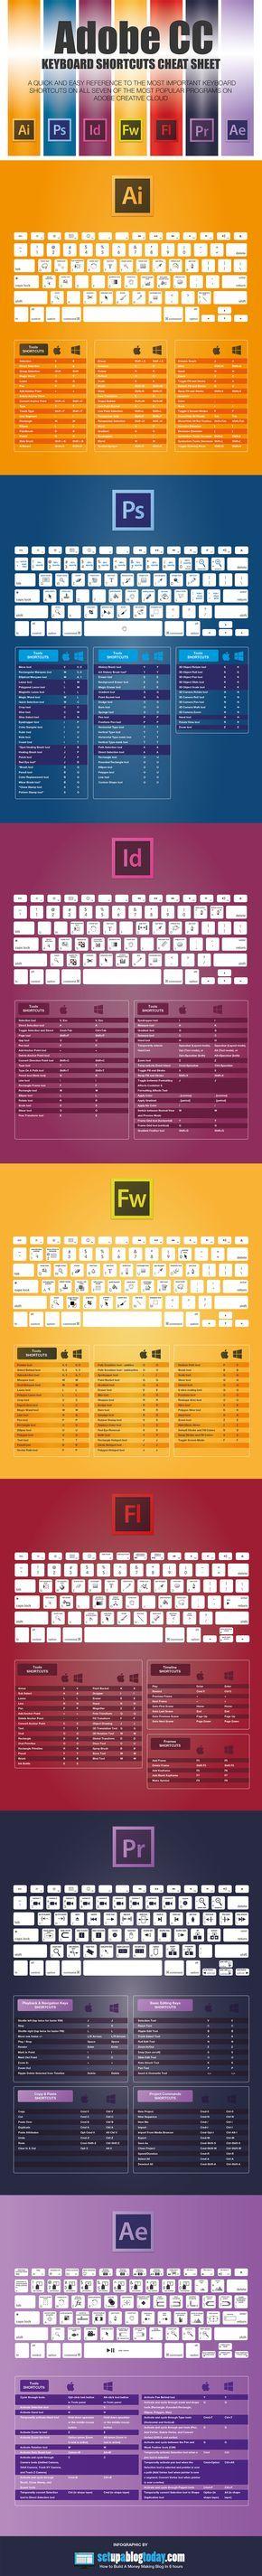 Infográfico: 100 atalhos para os 7 principais programas da Adobe Creative Cloud